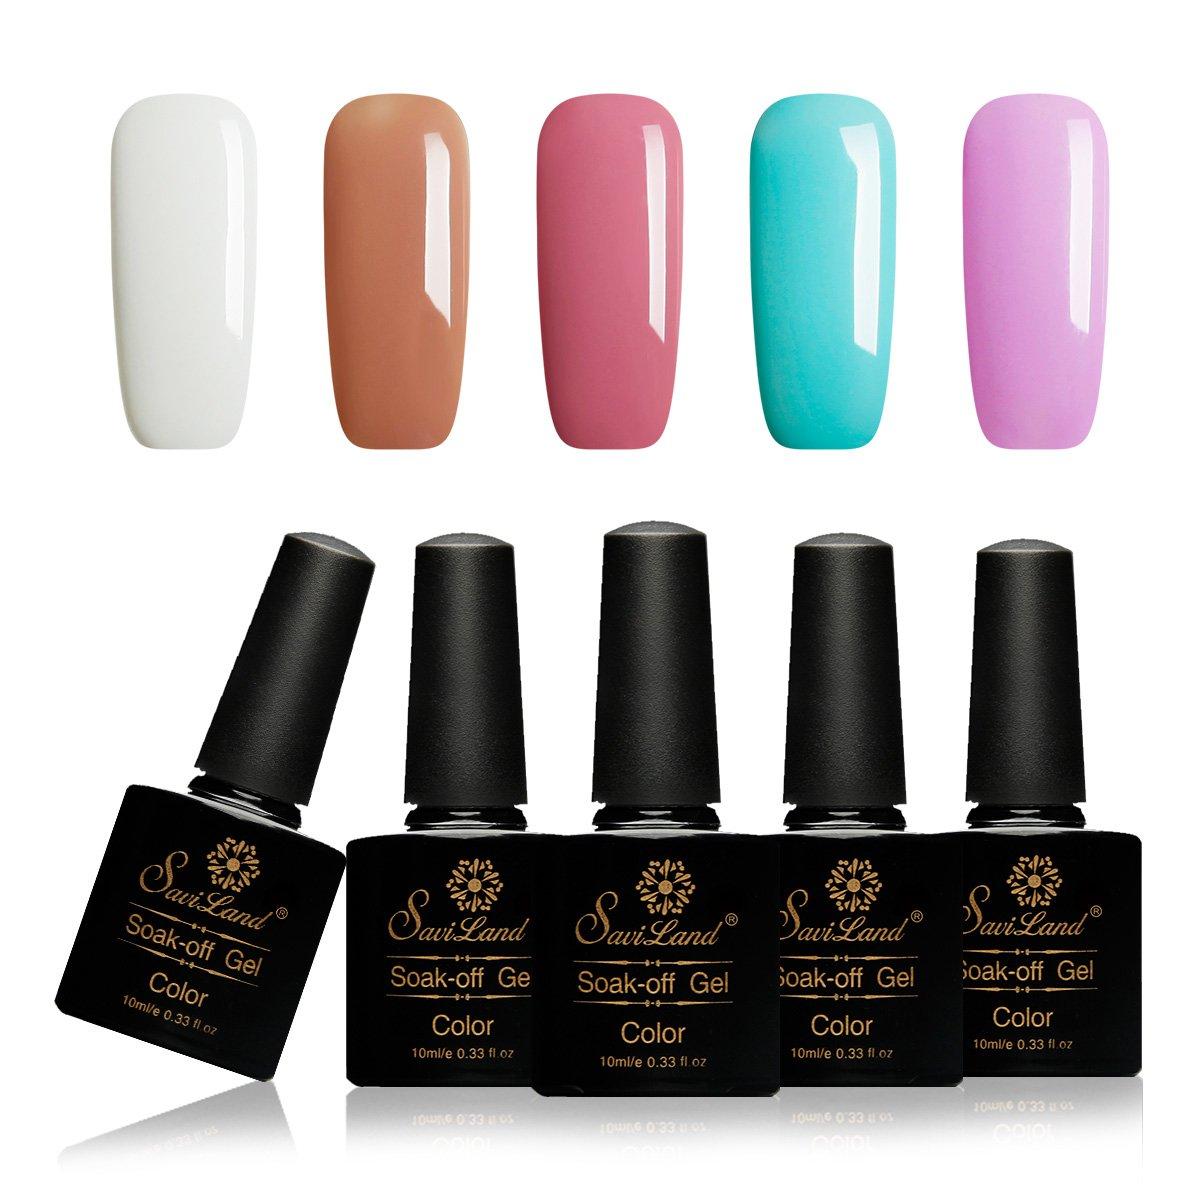 Saviland Gel Nail Polish Ocean Blue,UV LED Gel Polish Set, Manicure Varnish Color Gel 5 Pcs